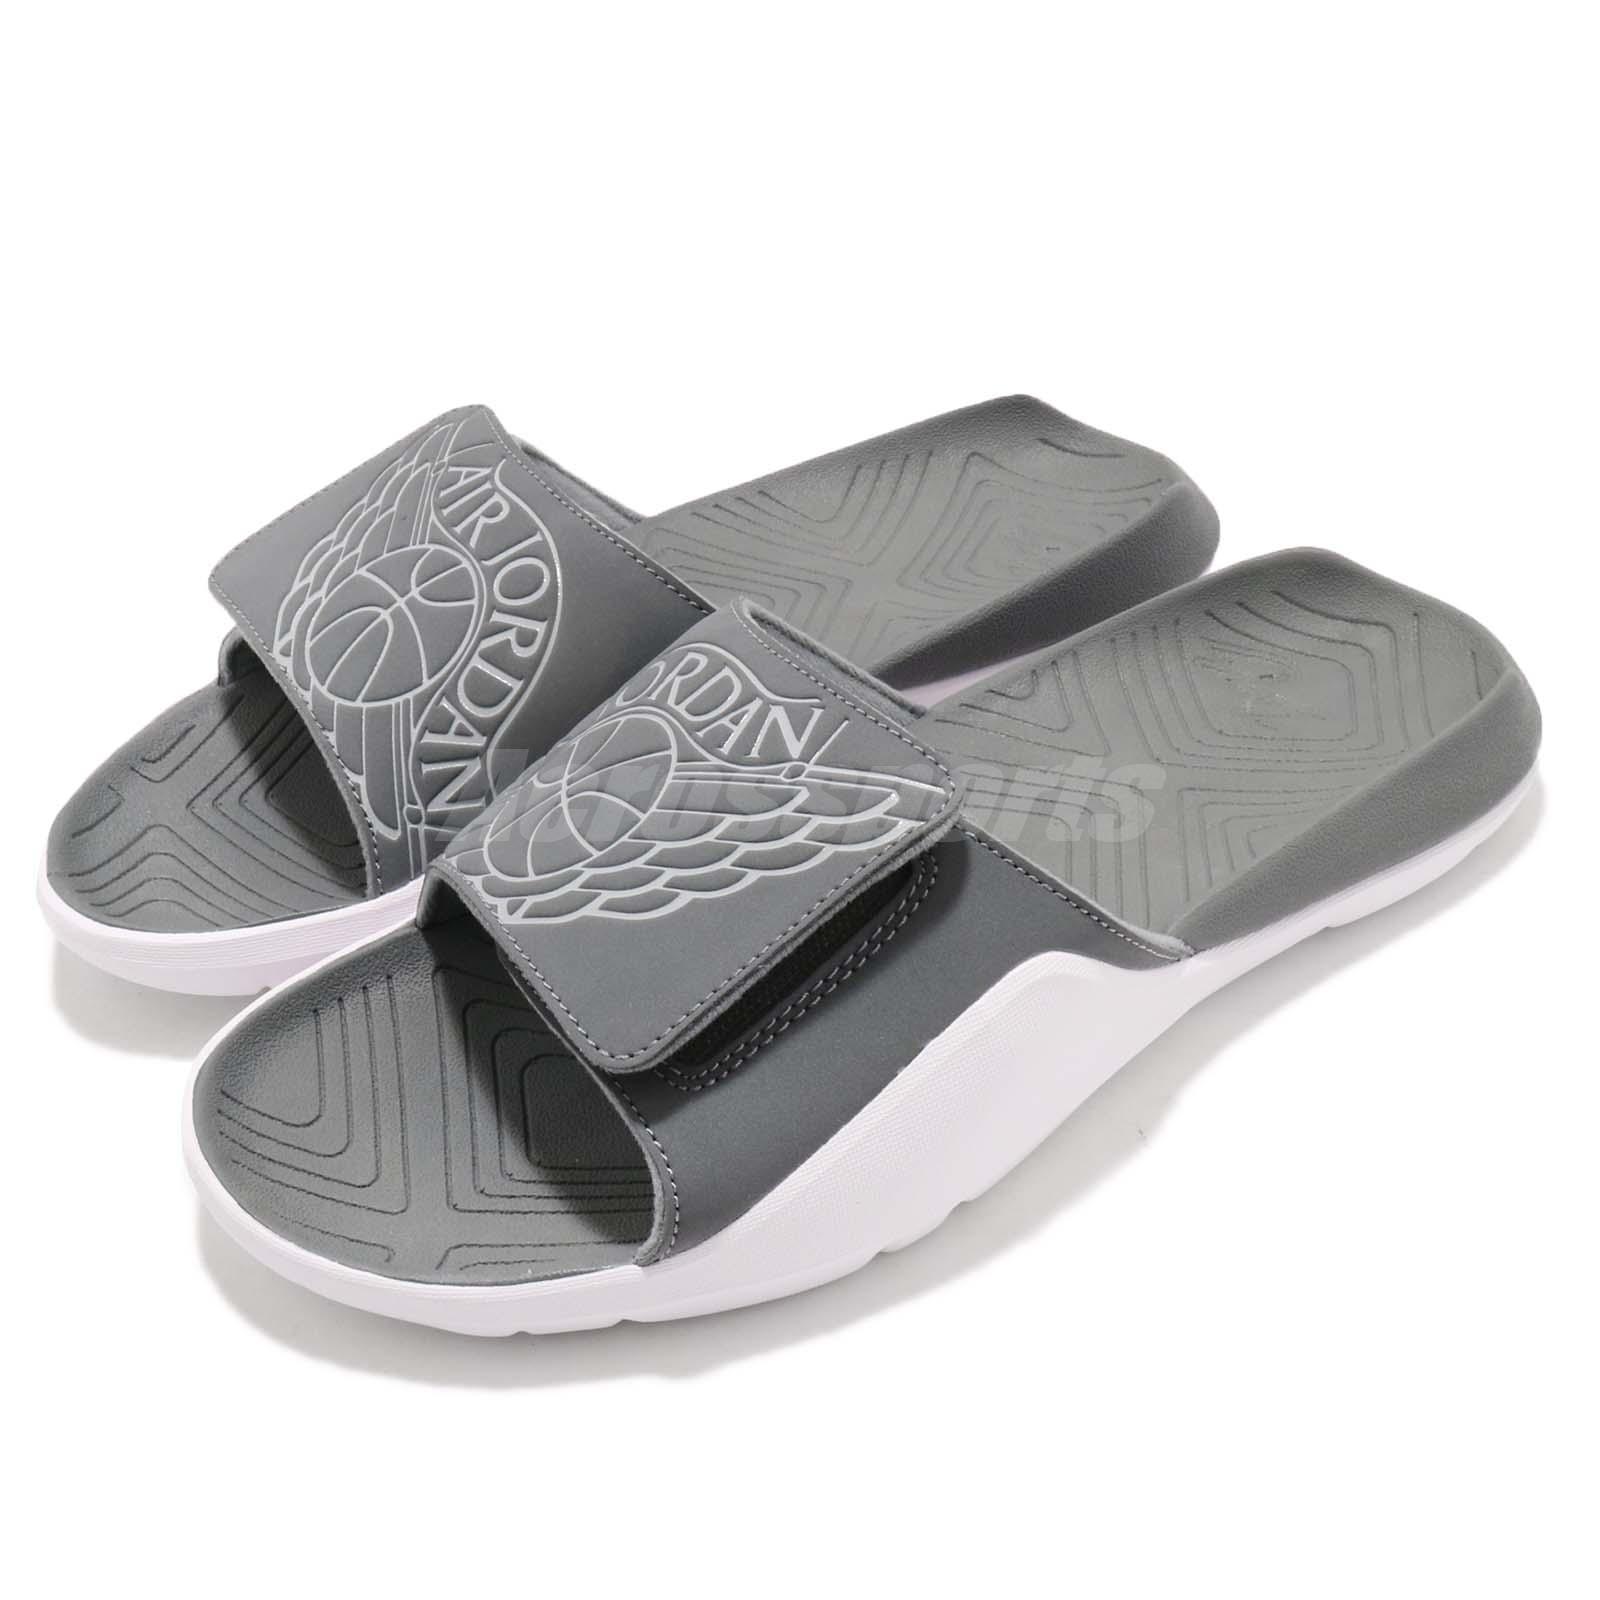 2b5e2f94374c57 Details about Nike Jordan Hydro 7 VII Grey White Men Sports Sandal Slides  Slippers AA2517-002